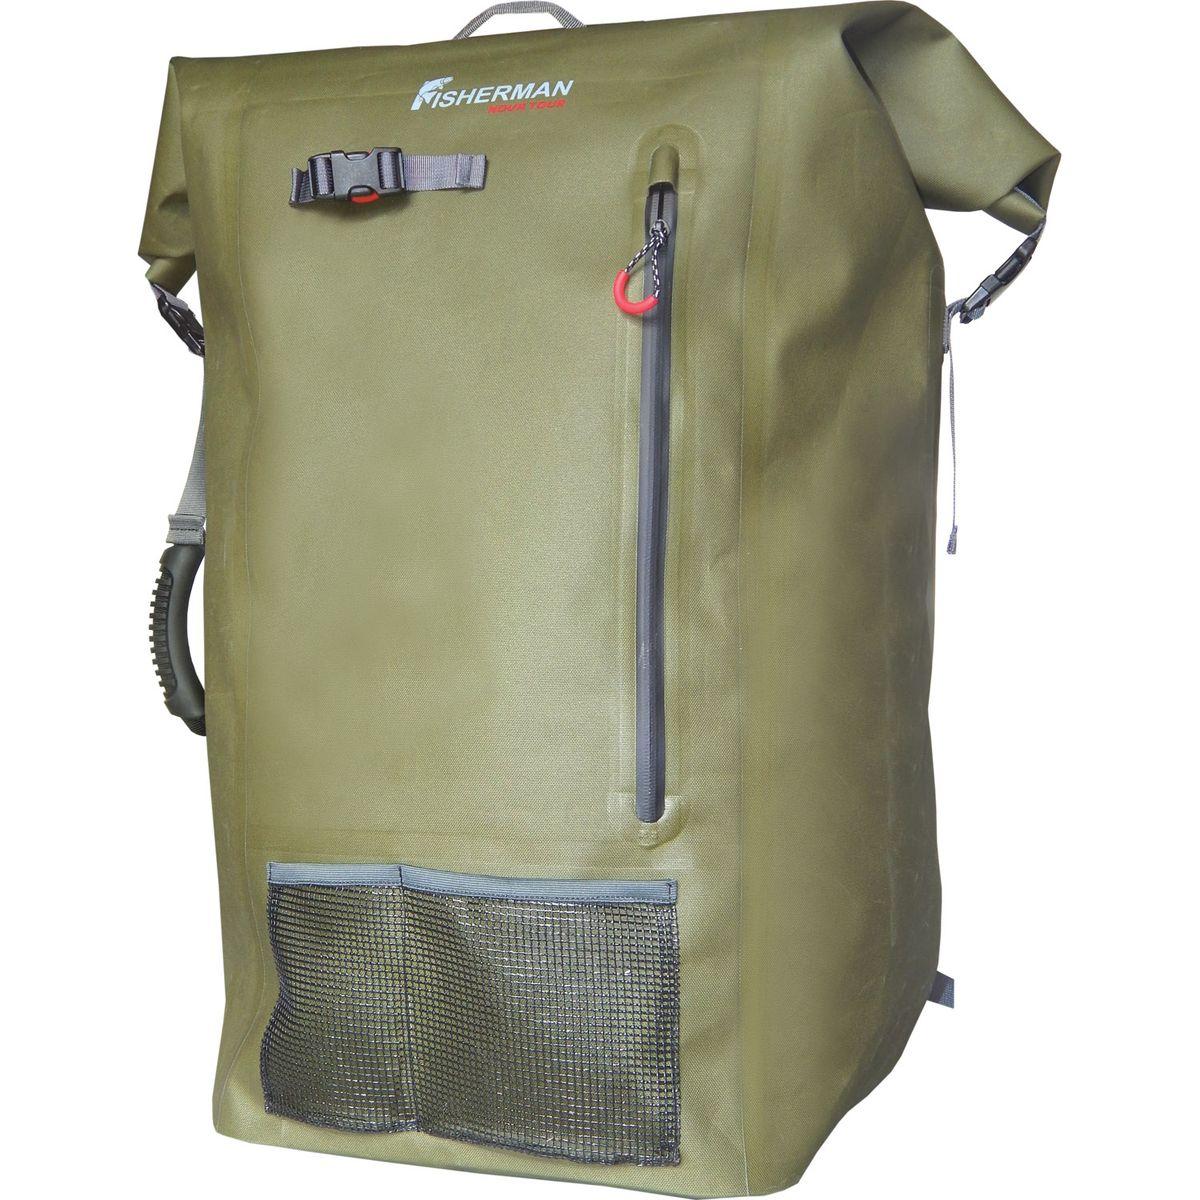 Рюкзаки fisherman купить рюкзак rollerclub рюкзак